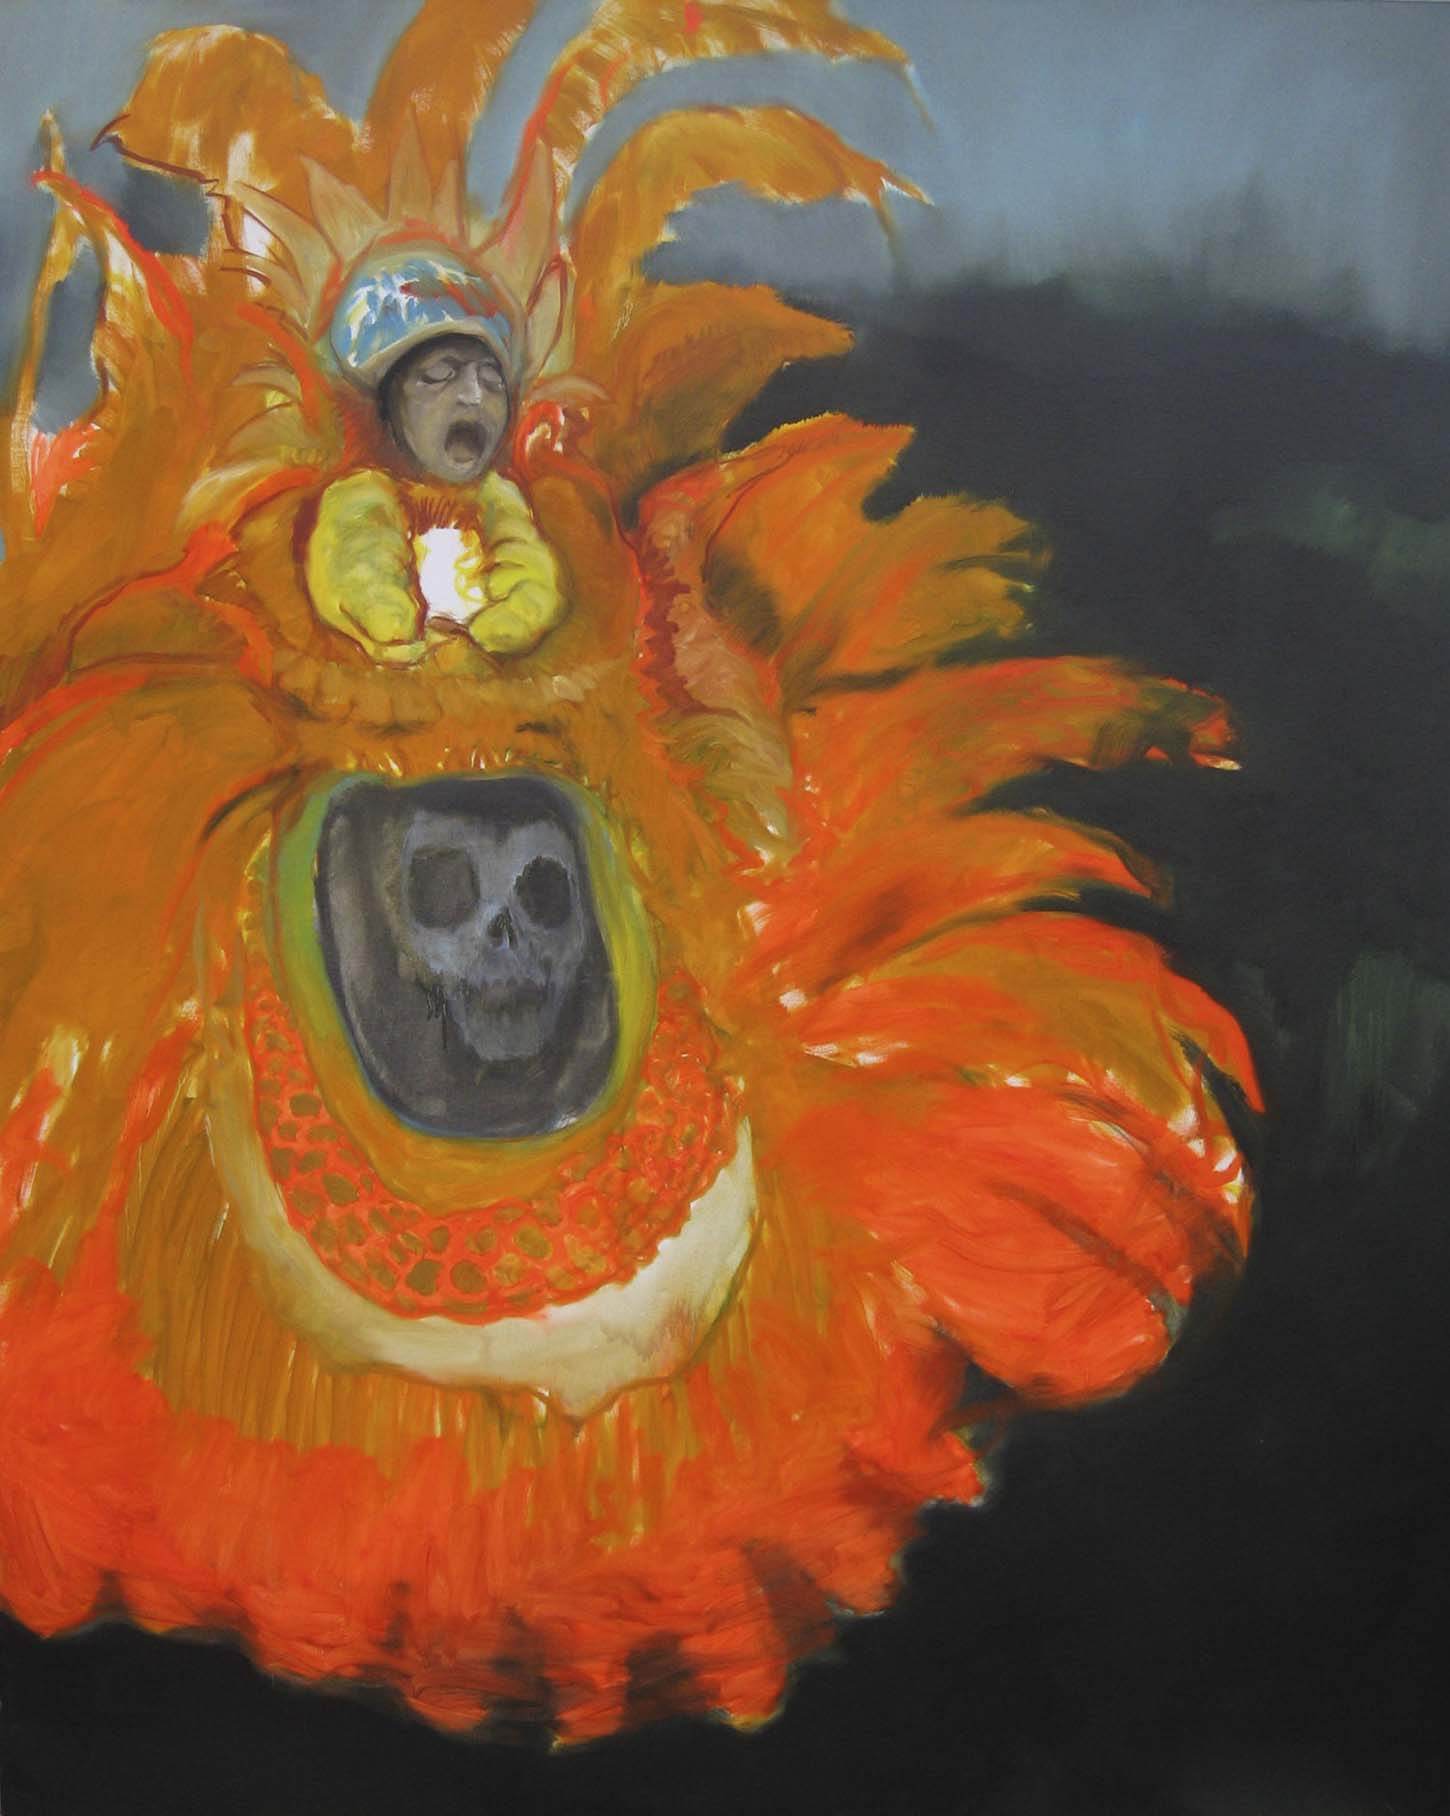 Romain bernini,Wild magnolia, huile sur toile, 200X160 cm, 2008